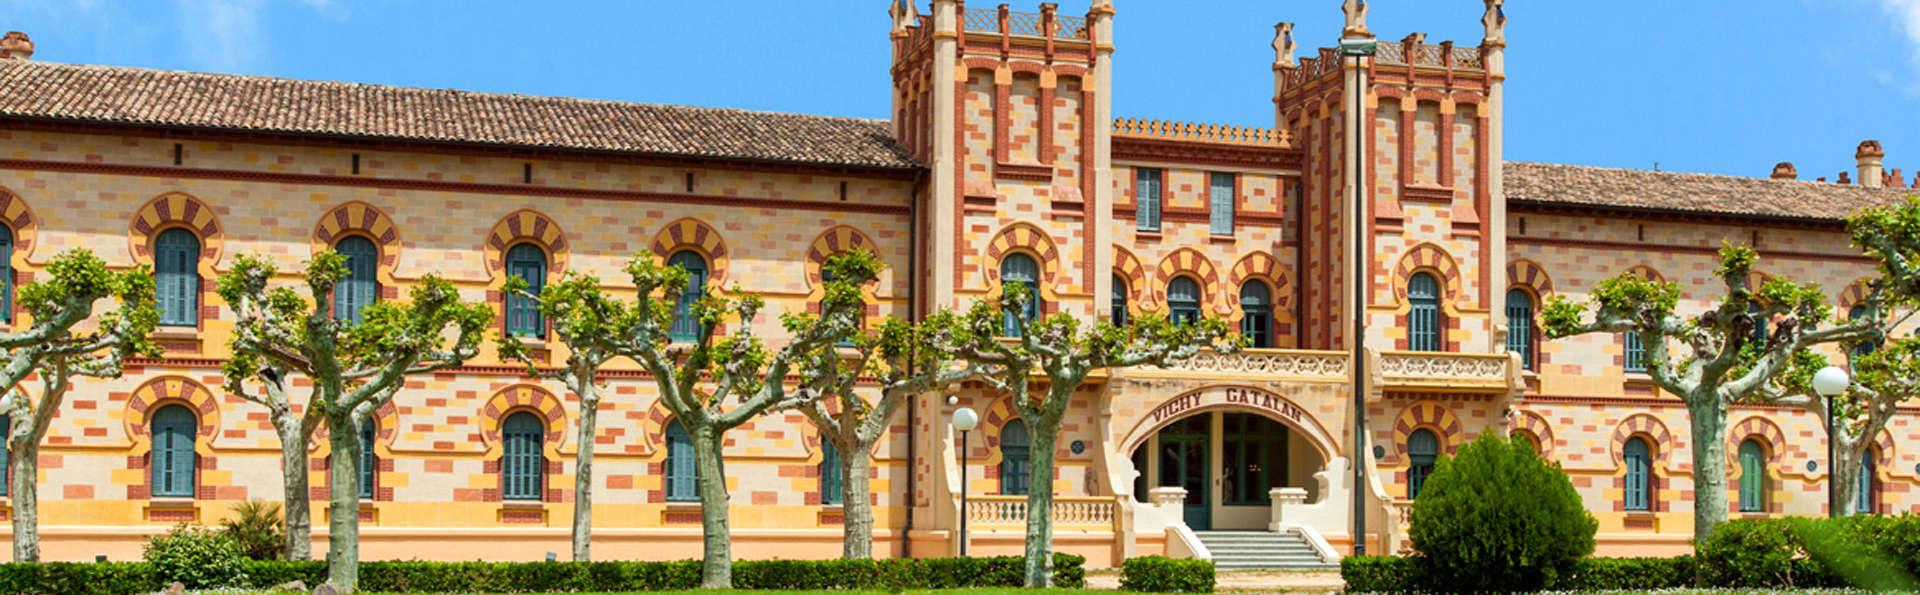 Hotel Balneari Vichy Catalan - EDIT-front22.jpg